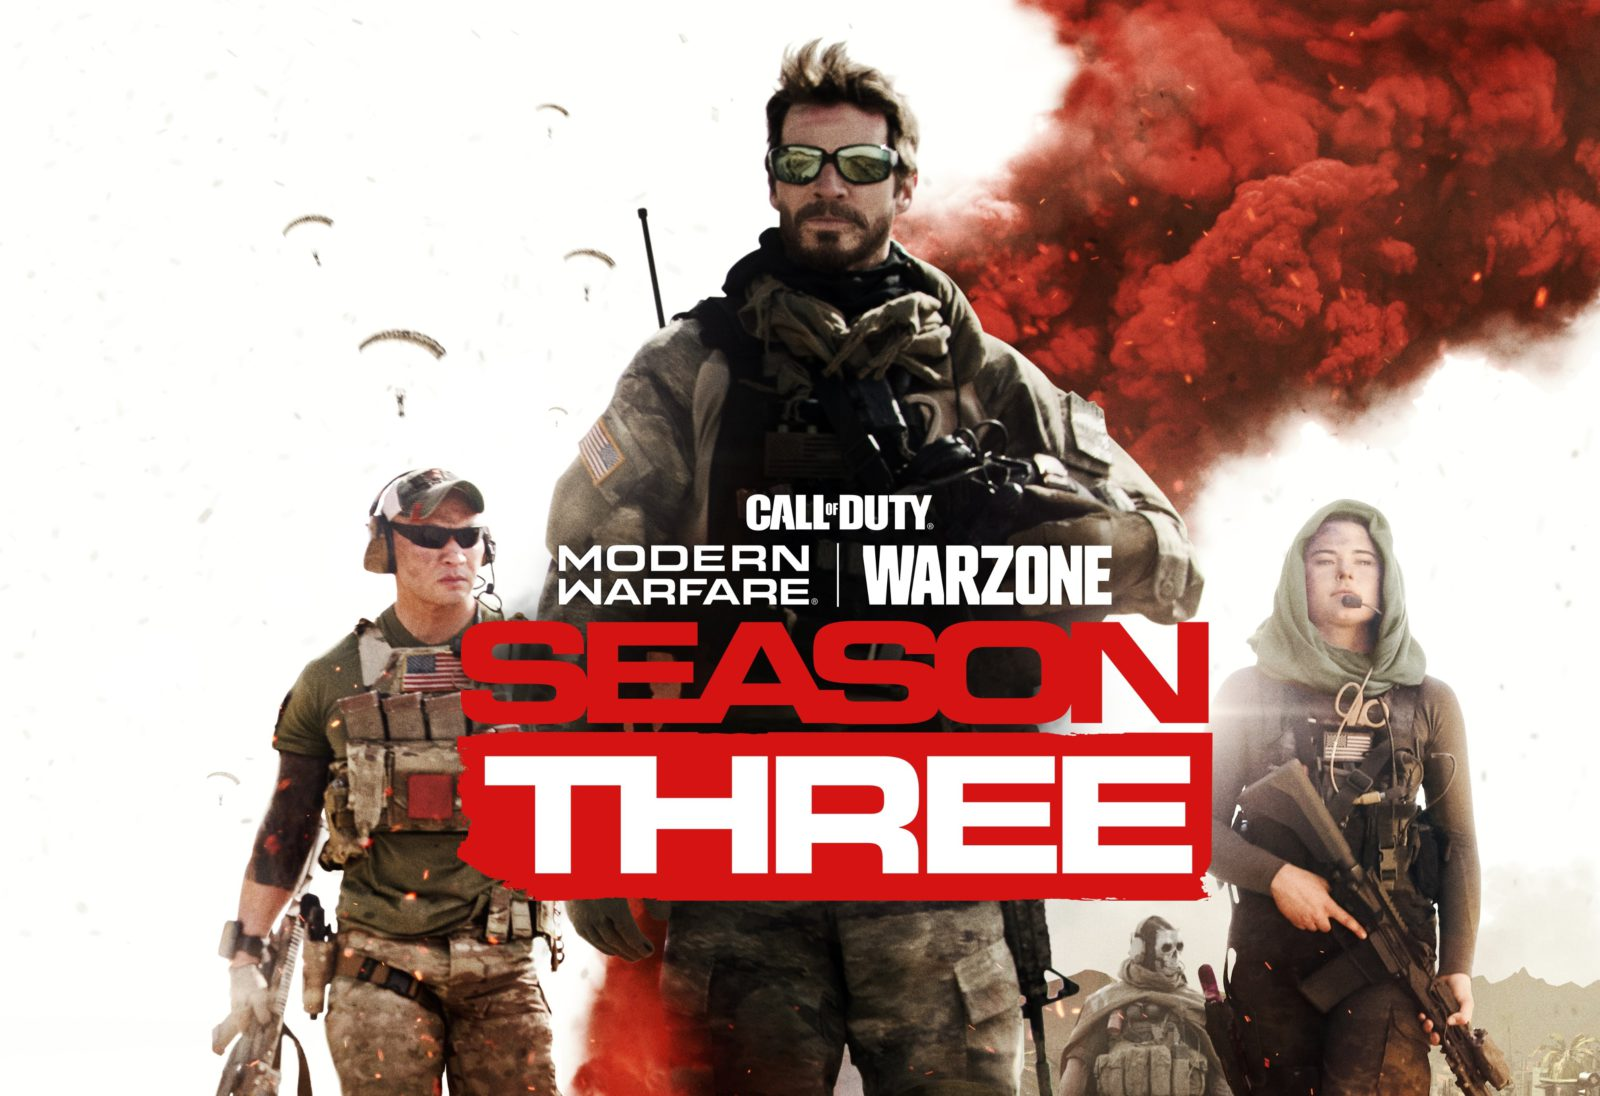 Call of Duty: Modern Warfare Terza Stagione